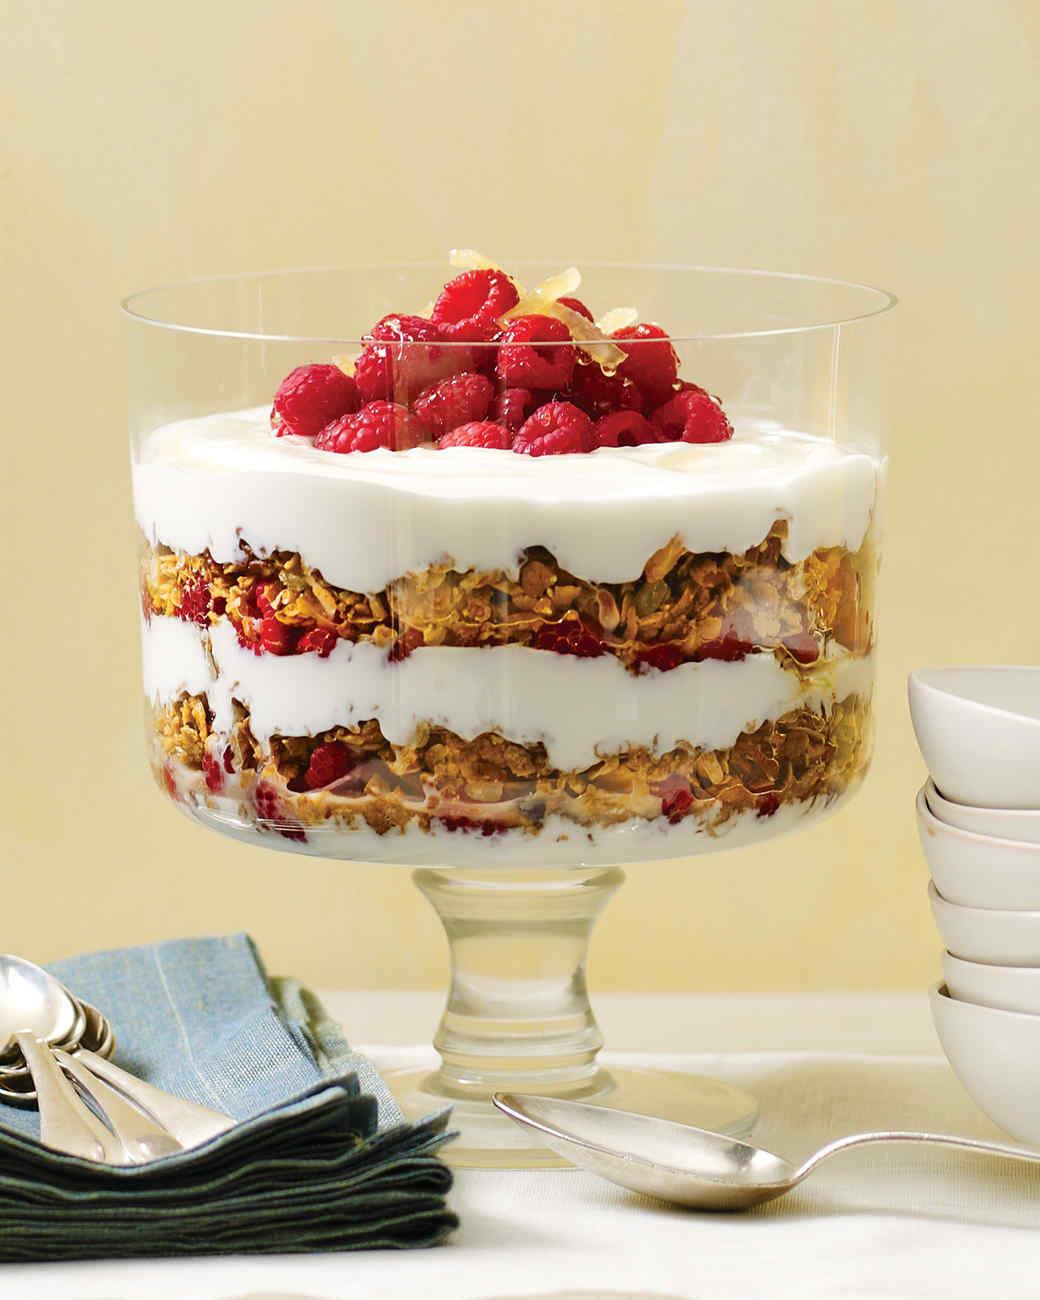 Yogurt Parfait with Granola, Raspberries, and Candied Ginger